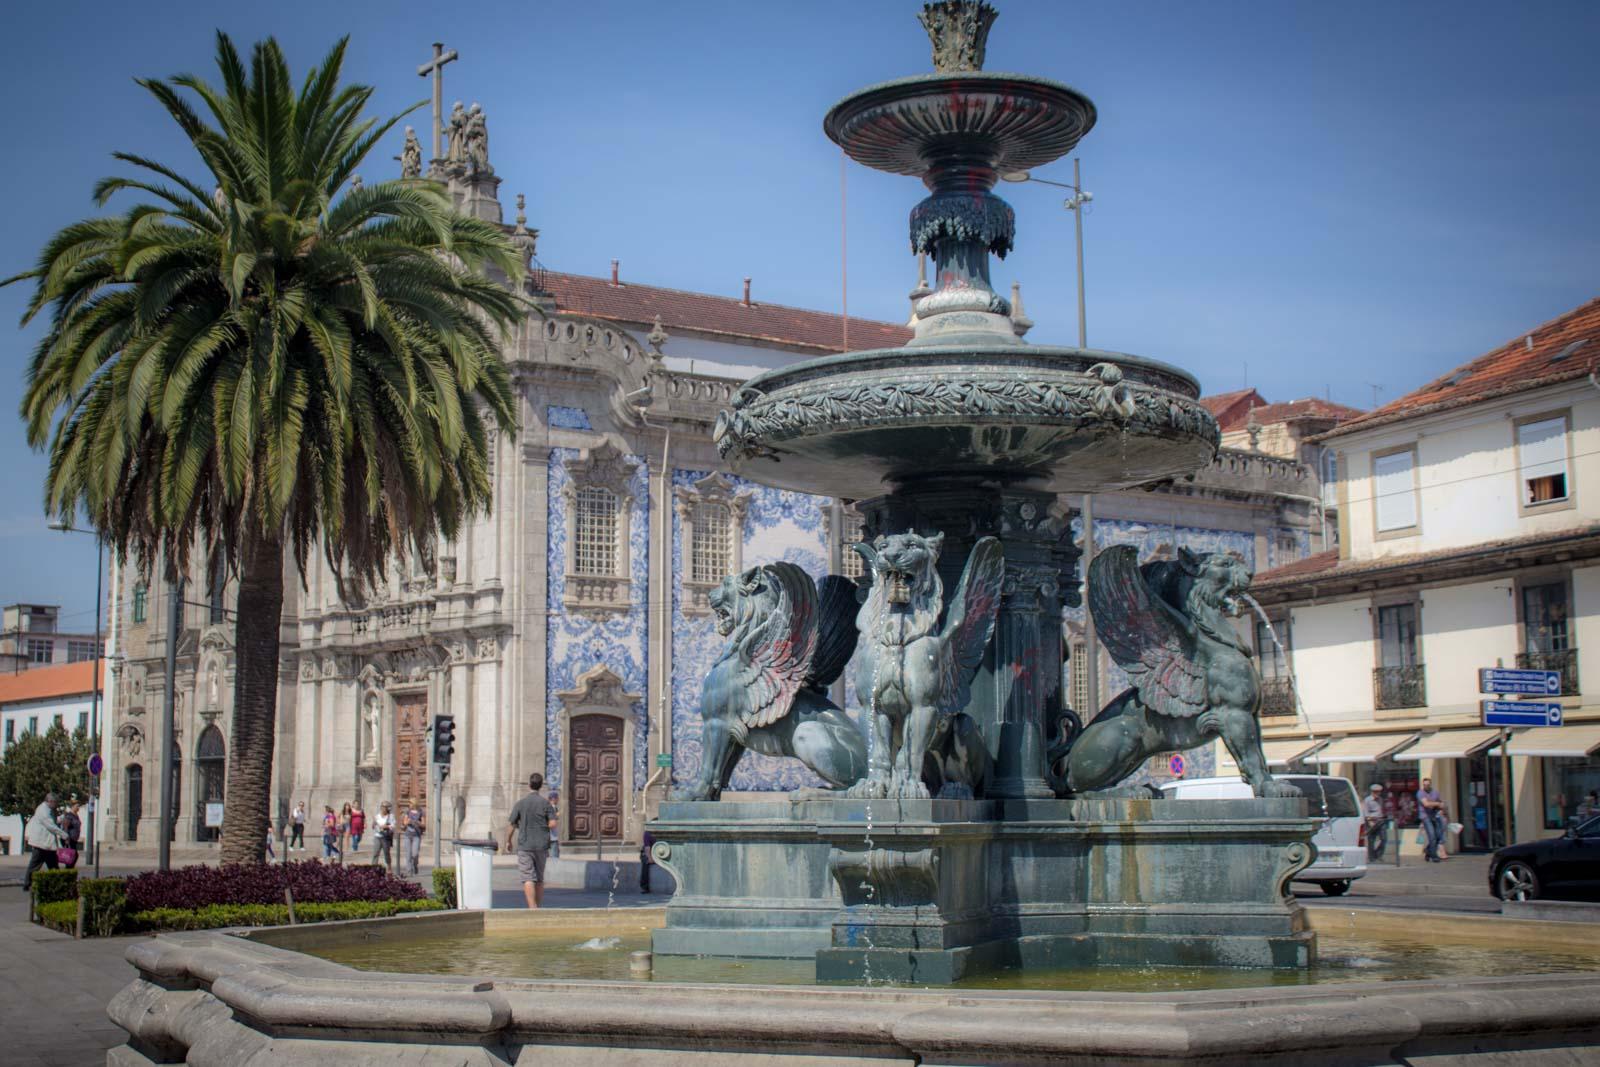 Derelict buildings in Oporto, Portugal